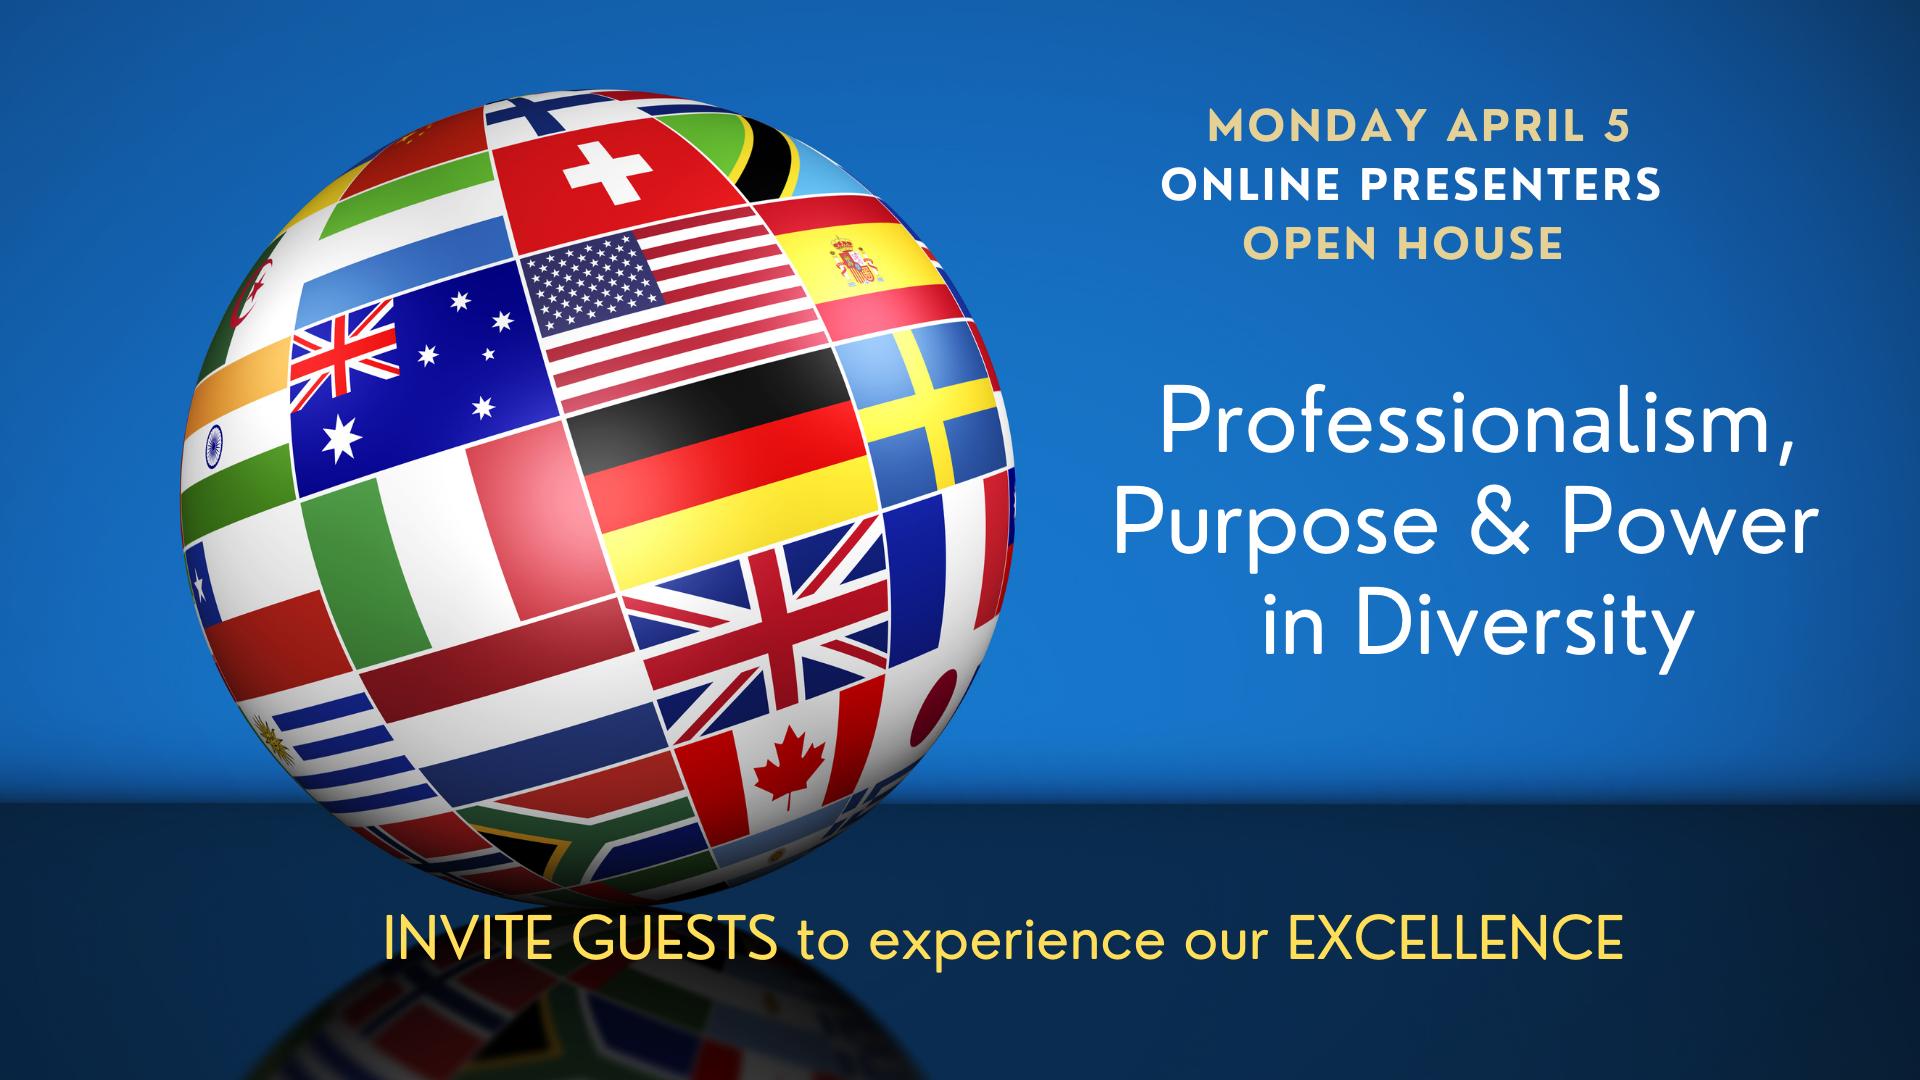 Online Presenters PRESS 3/28/21